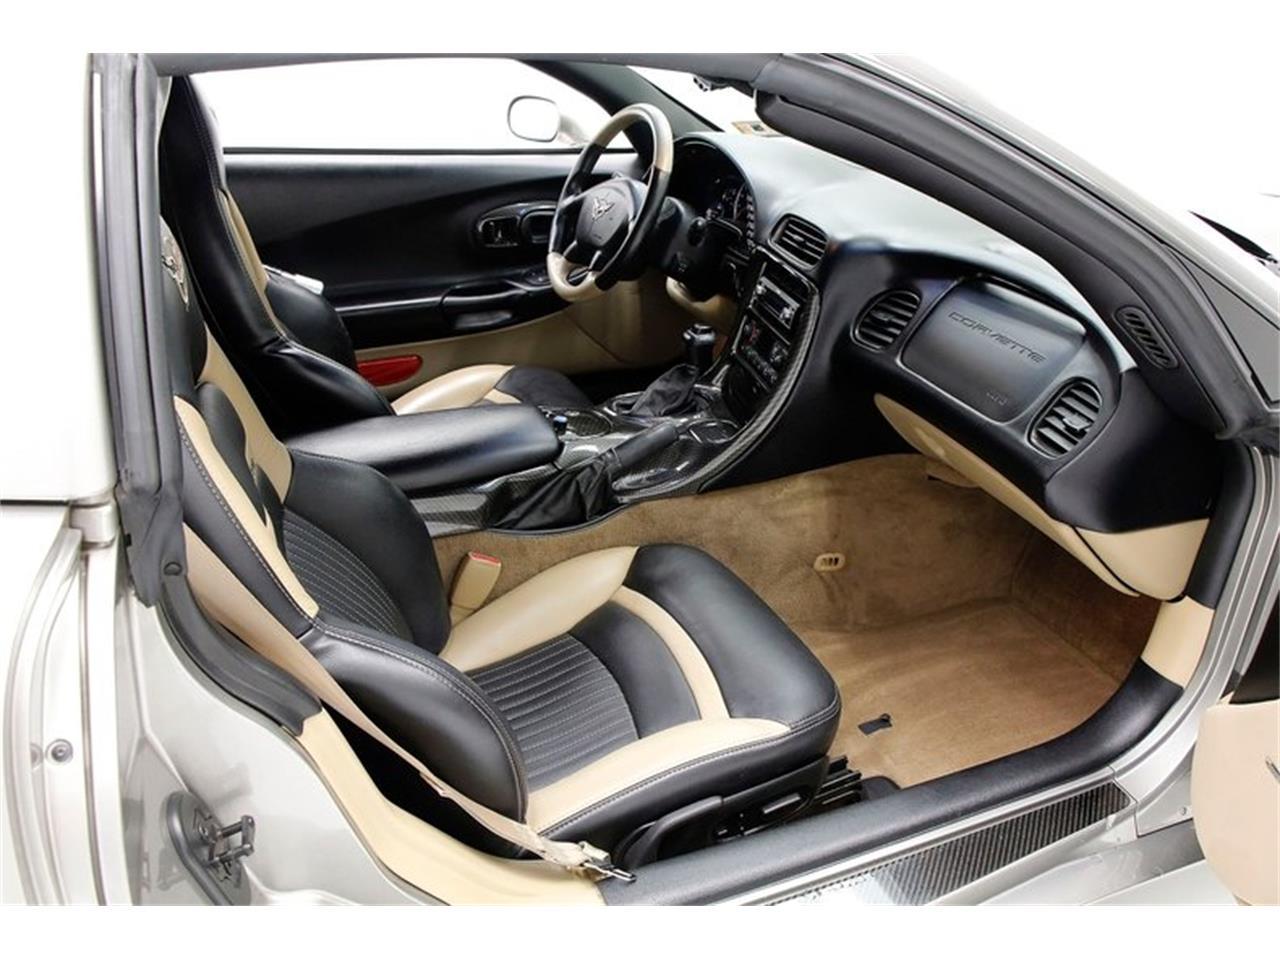 2000 Chevrolet Corvette (CC-1267448) for sale in Morgantown, Pennsylvania